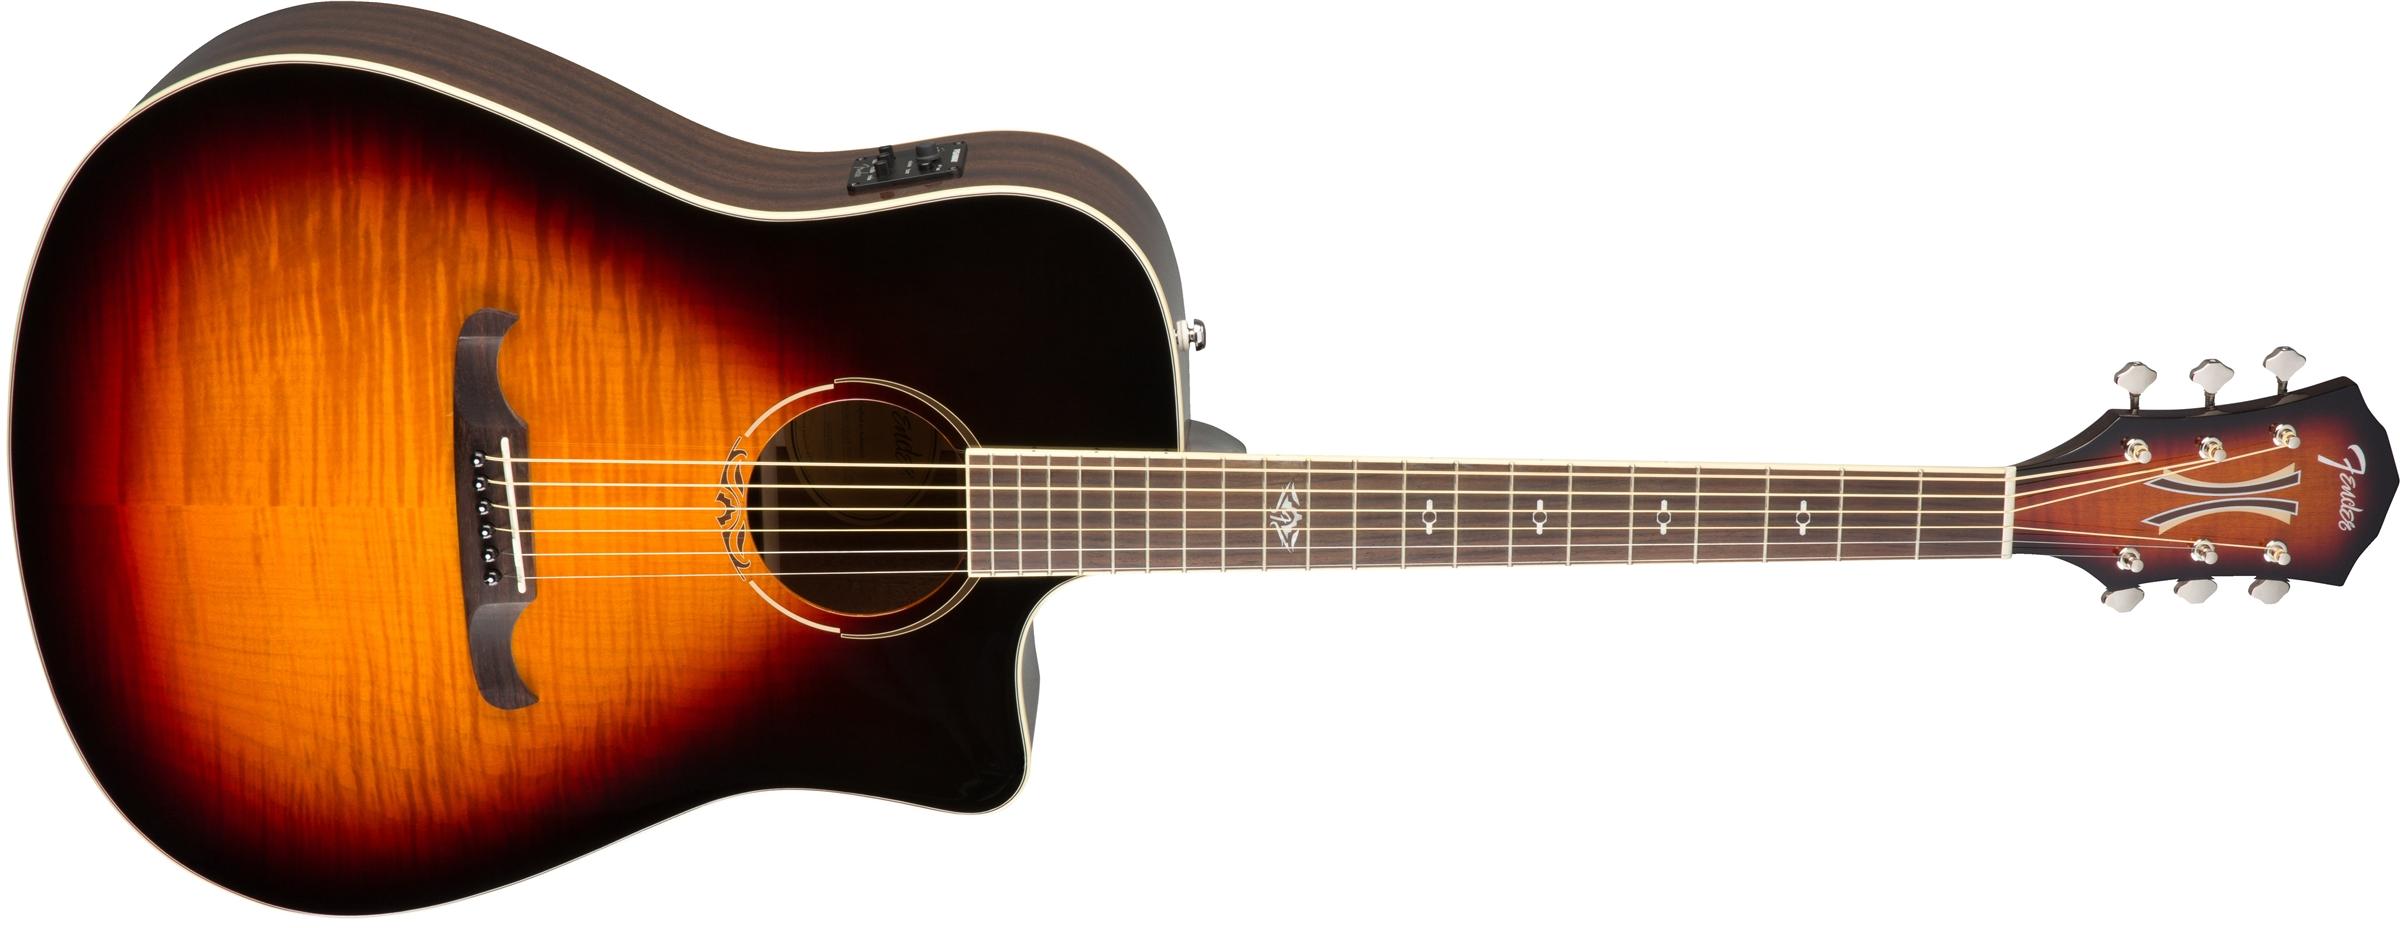 Fender T Bucket 300ce Review : fender t bucket 300ce 2016 current image 1670496 audiofanzine ~ Hamham.info Haus und Dekorationen